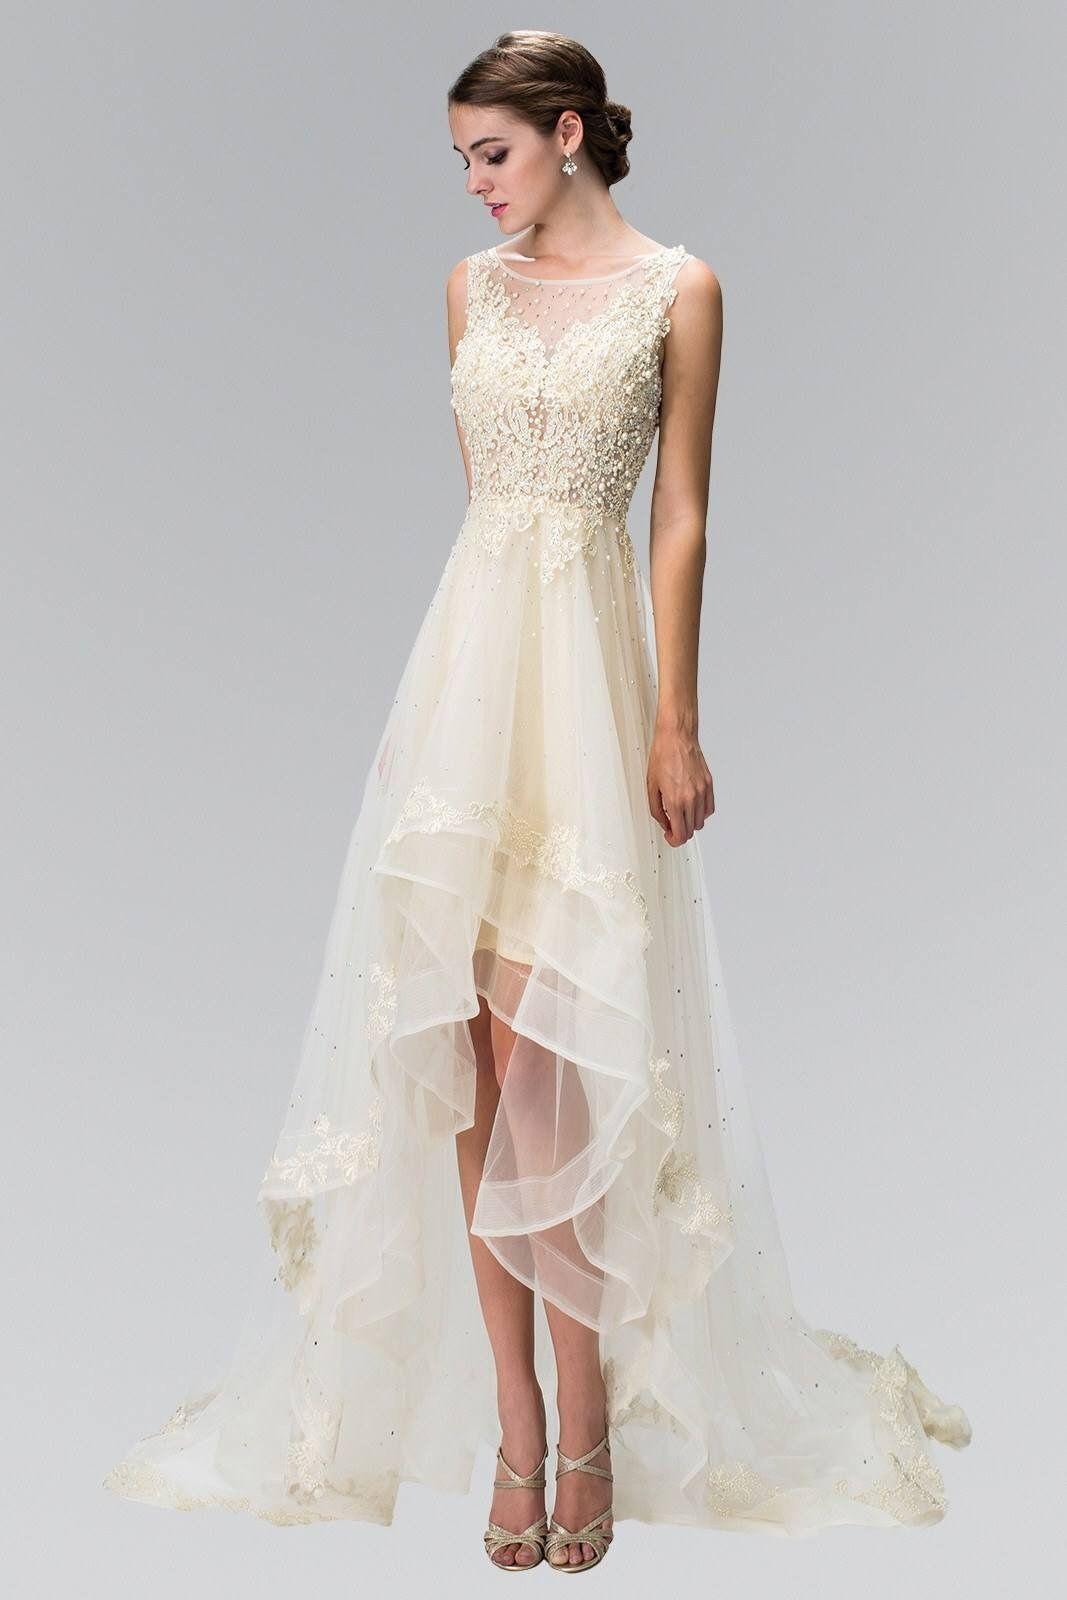 50+ High to Low Wedding Dress - Best Shapewear for Wedding Dress ...